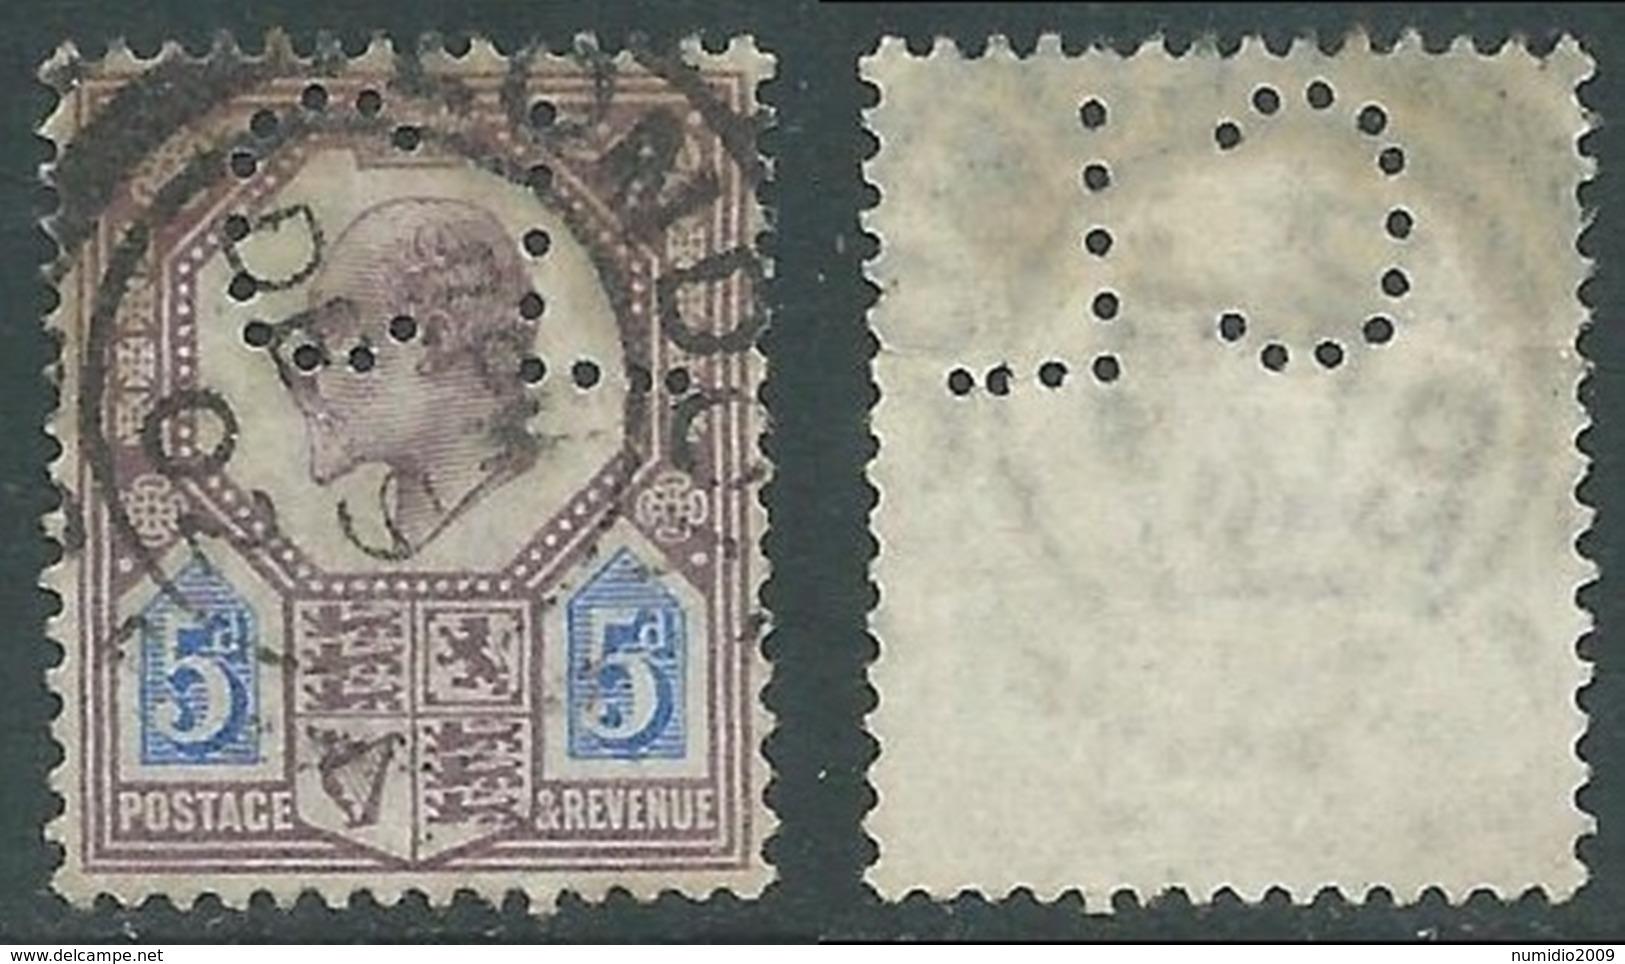 1902-10 GREAT BRITAIN USED SG 242 5d DULL PUR & ULTRAMARINE PERFIN - F22 - 1902-1951 (Re)